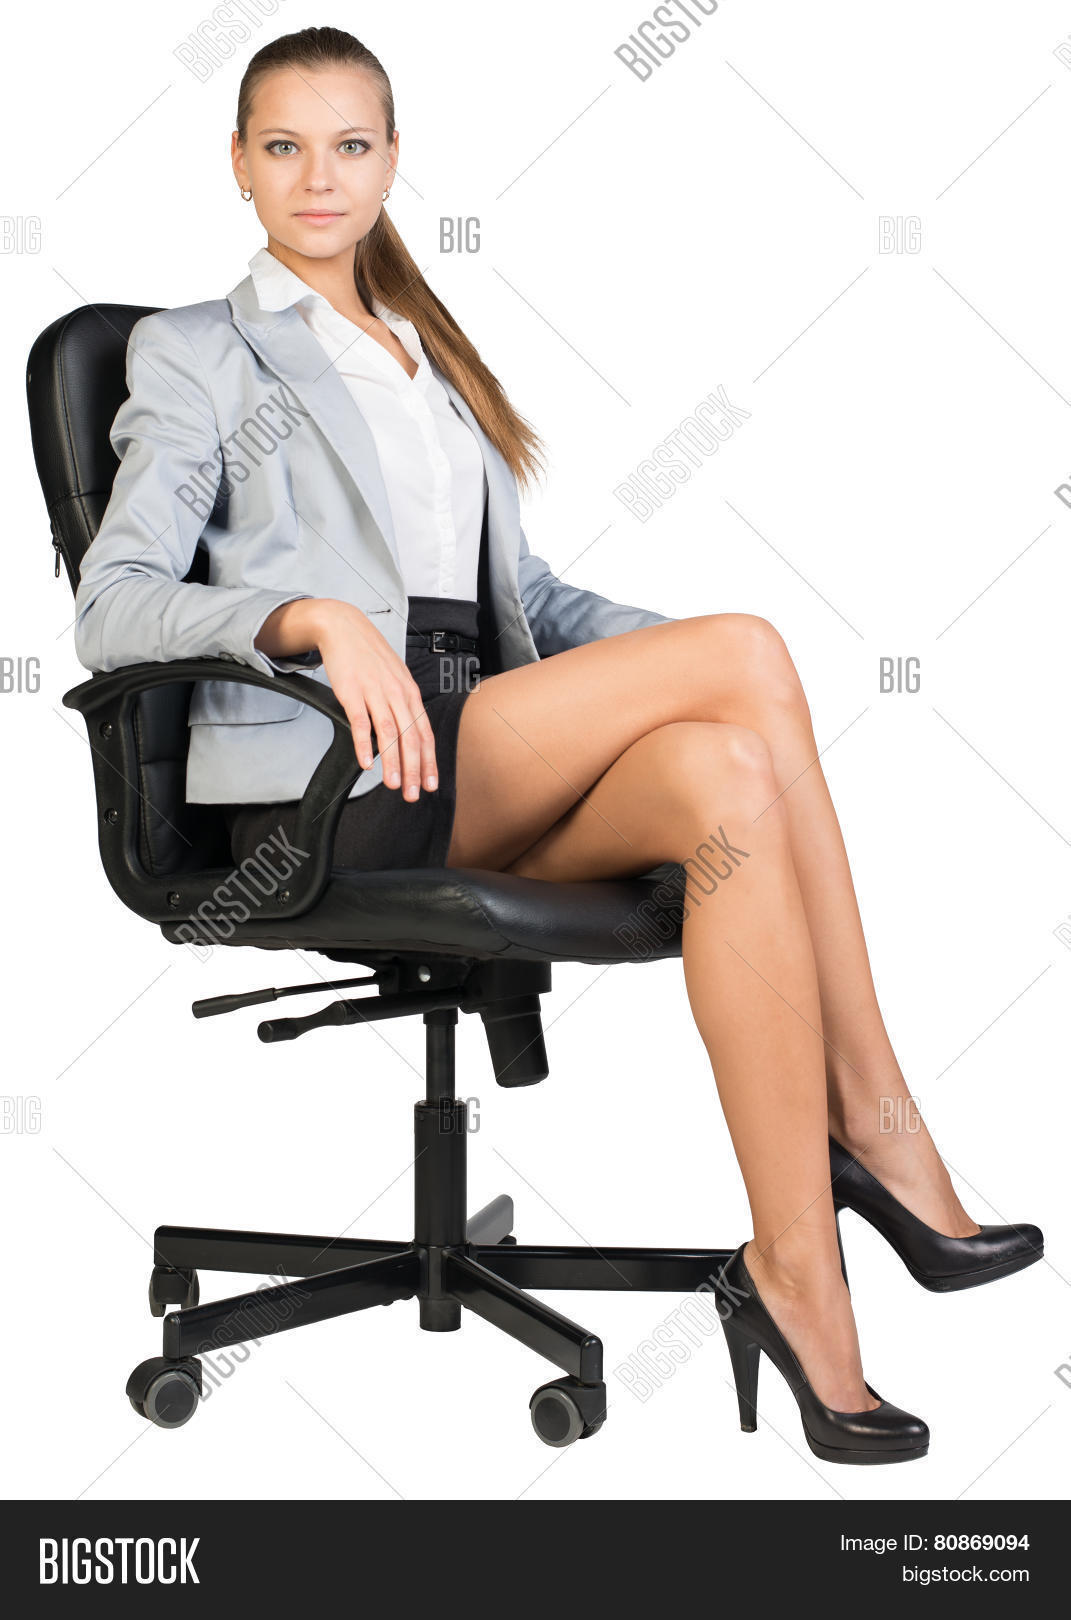 desk chair legs rimworld vs stool businesswoman office straight image and photo bigstock